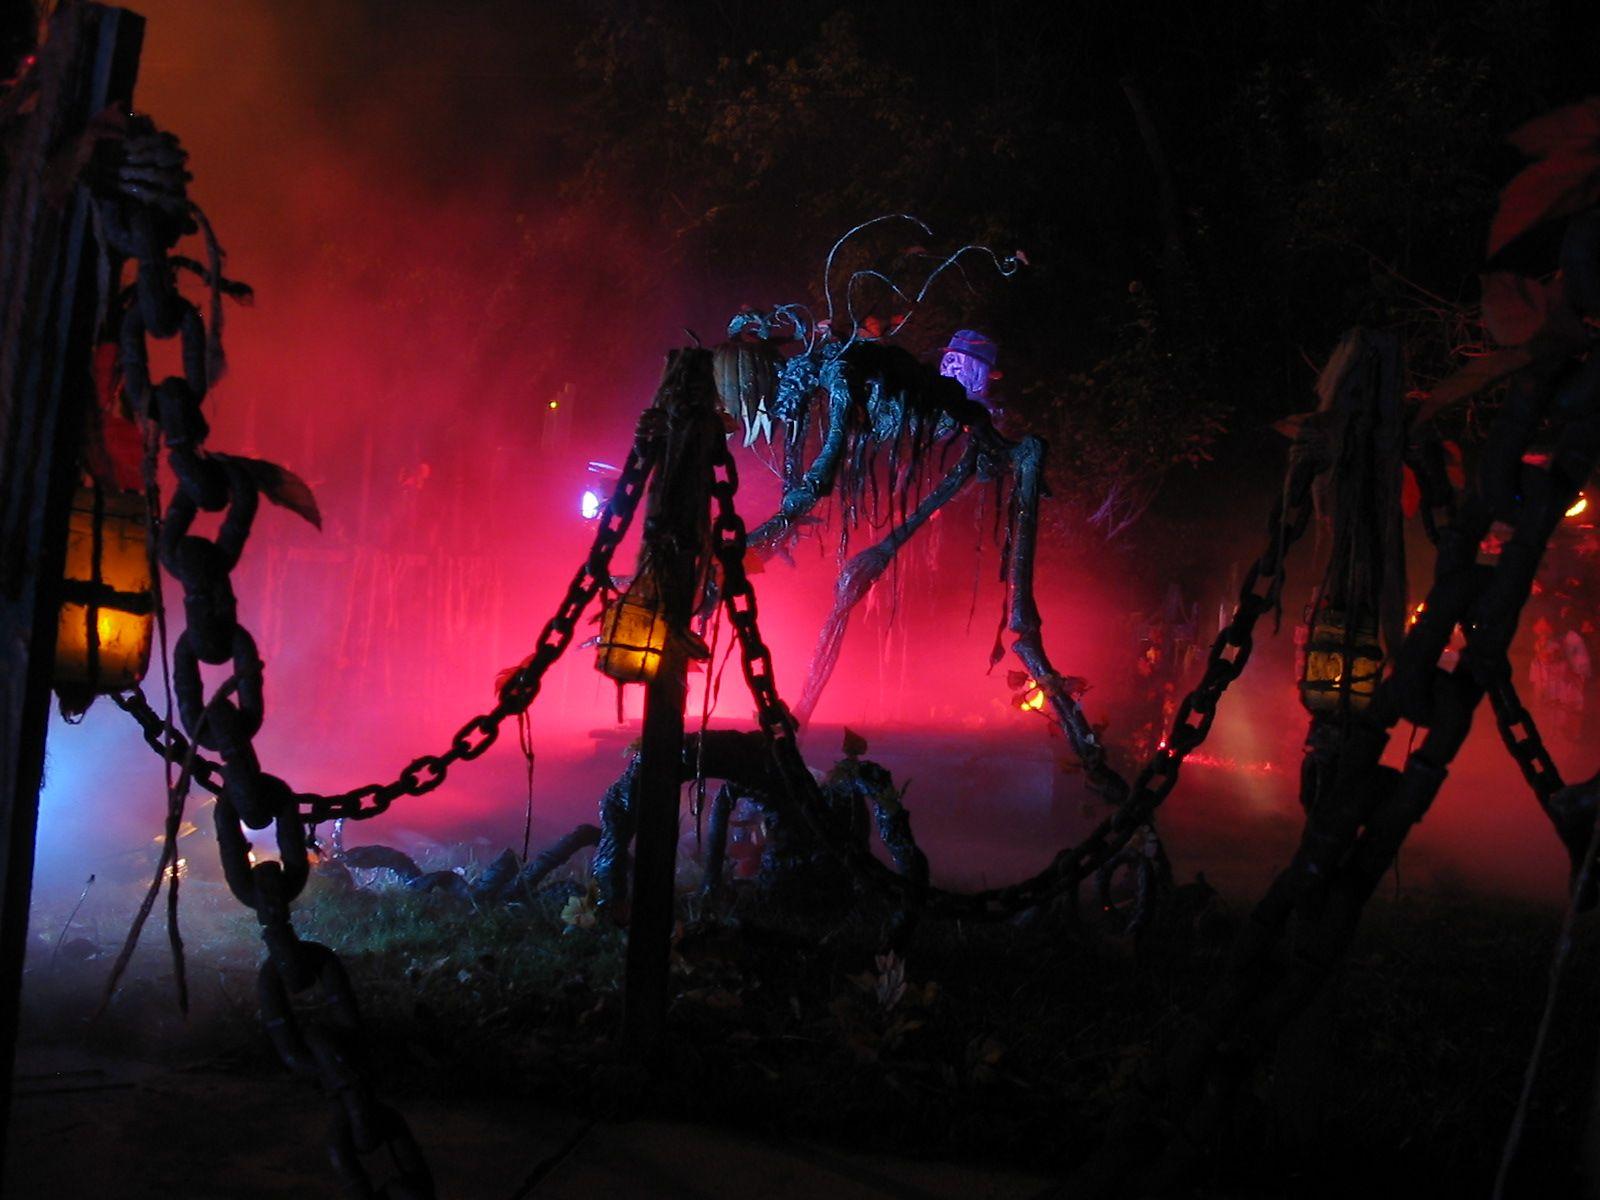 haunted house lighting ideas. Haunted Houses House Lighting Ideas